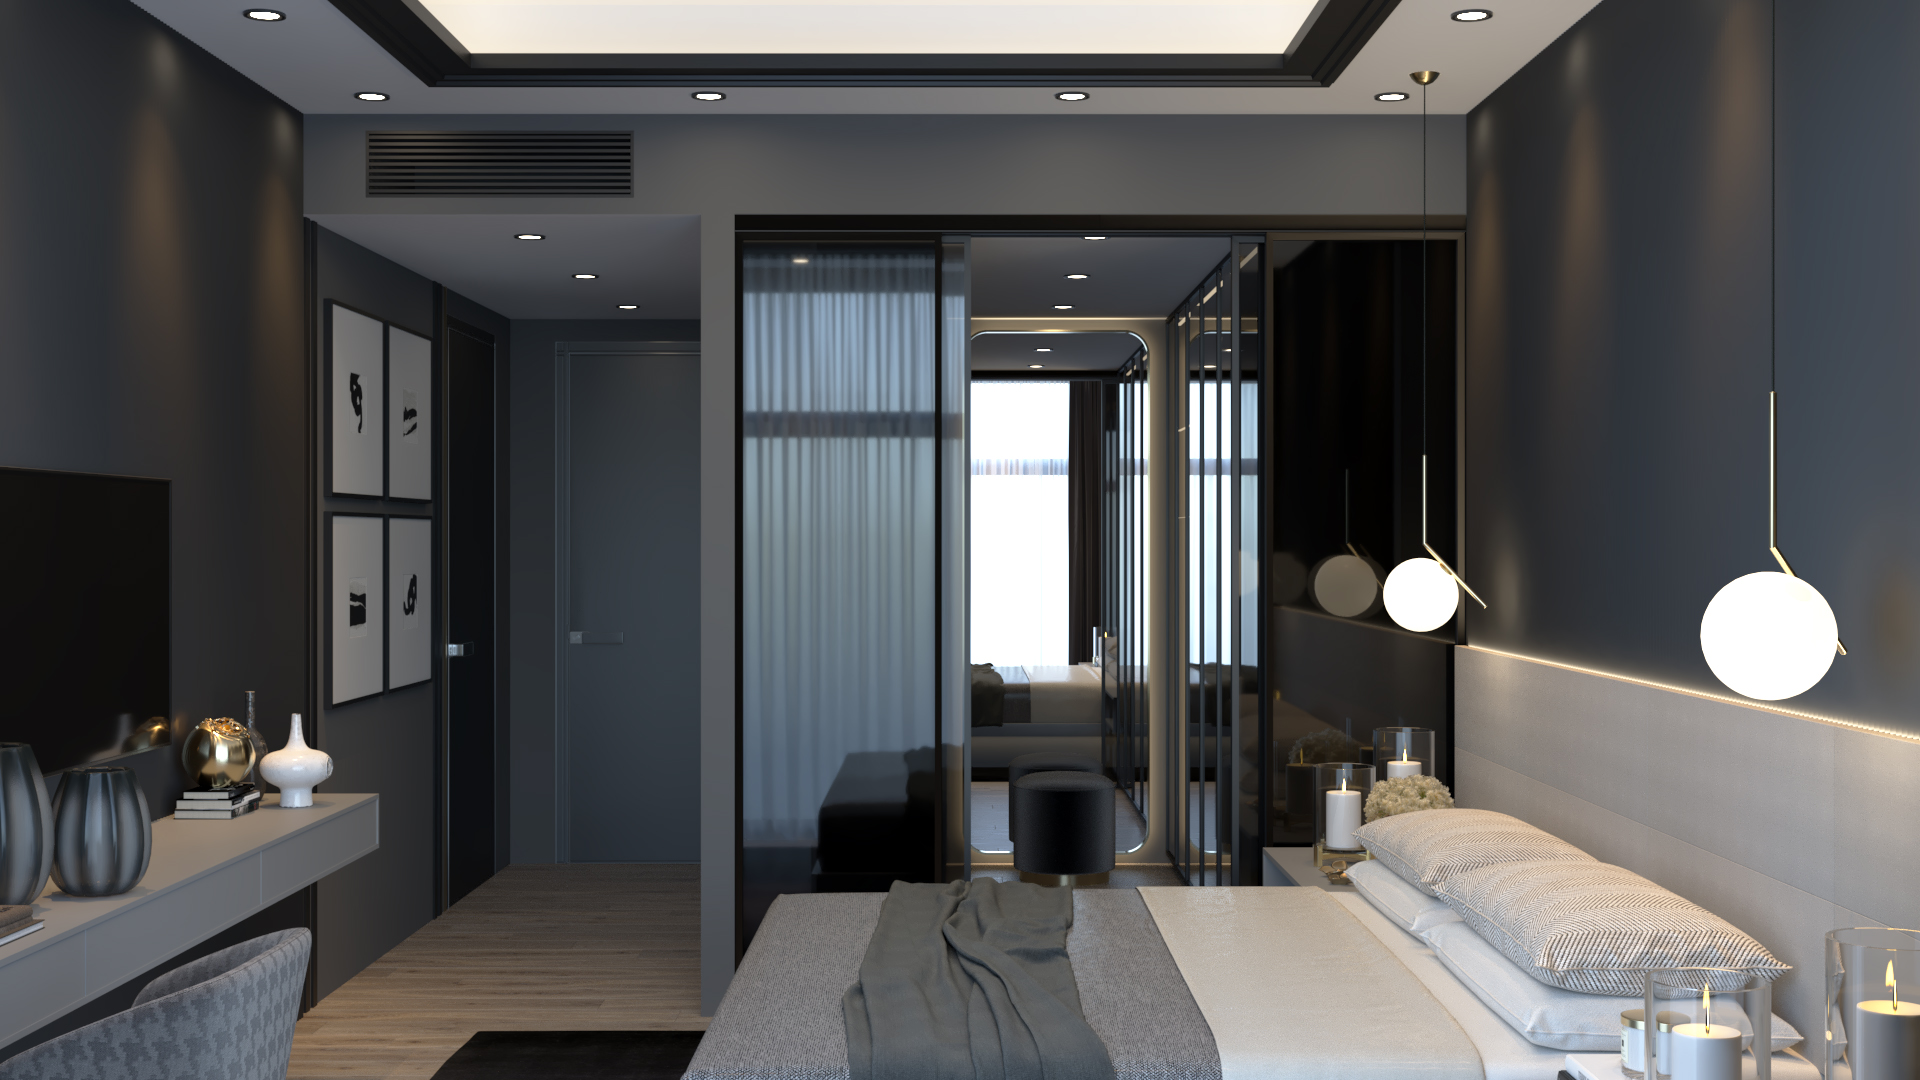 Luxury bedroom 03 total